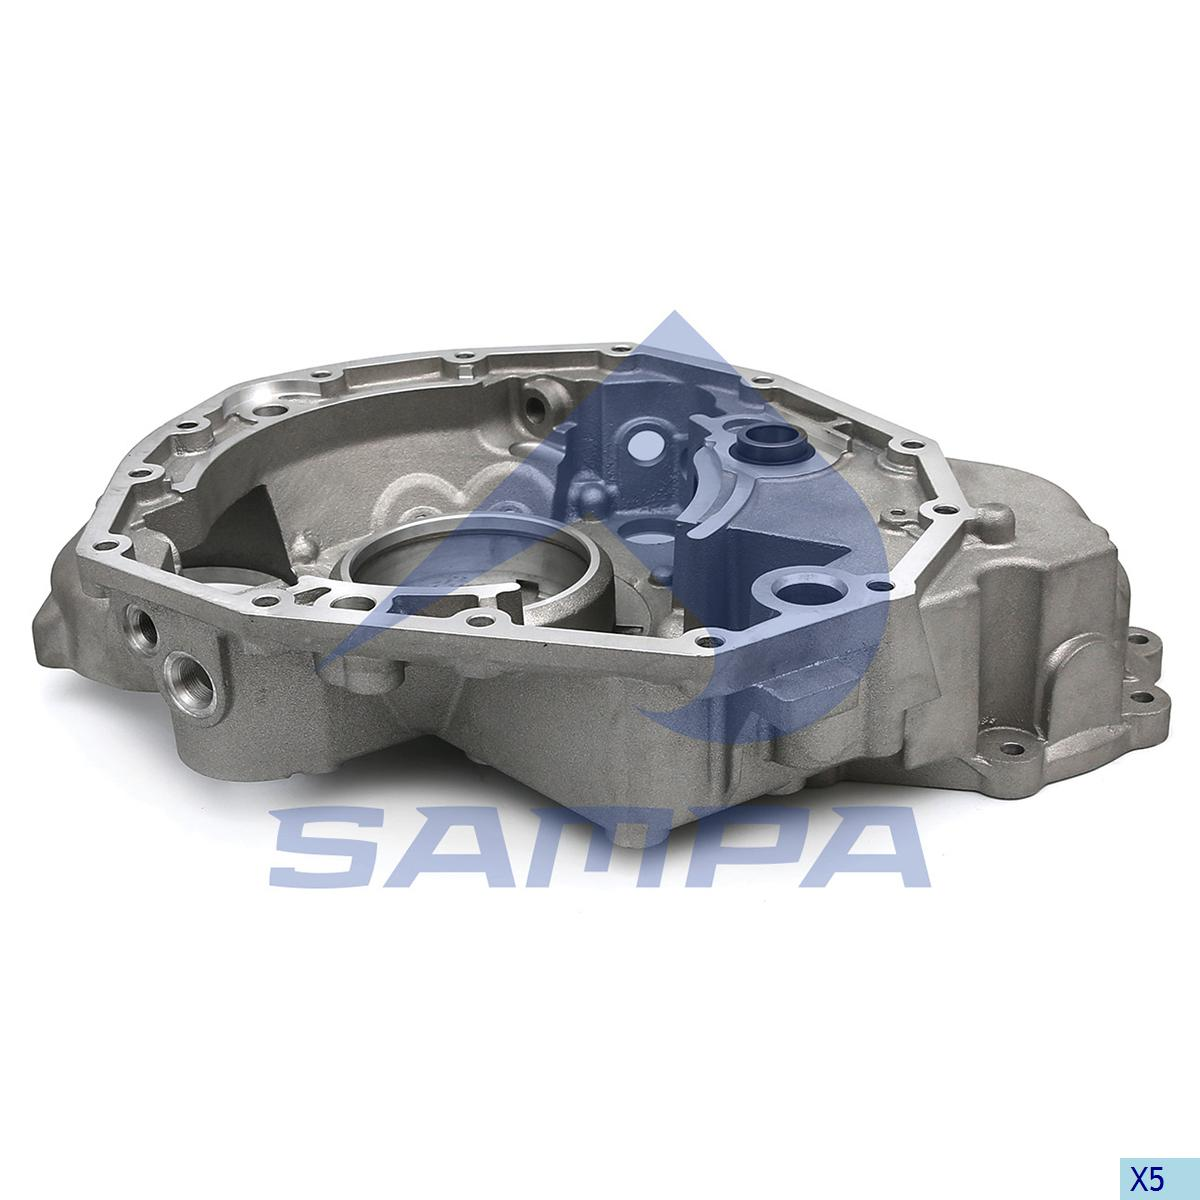 Housing, Flywheel, Scania, Engine